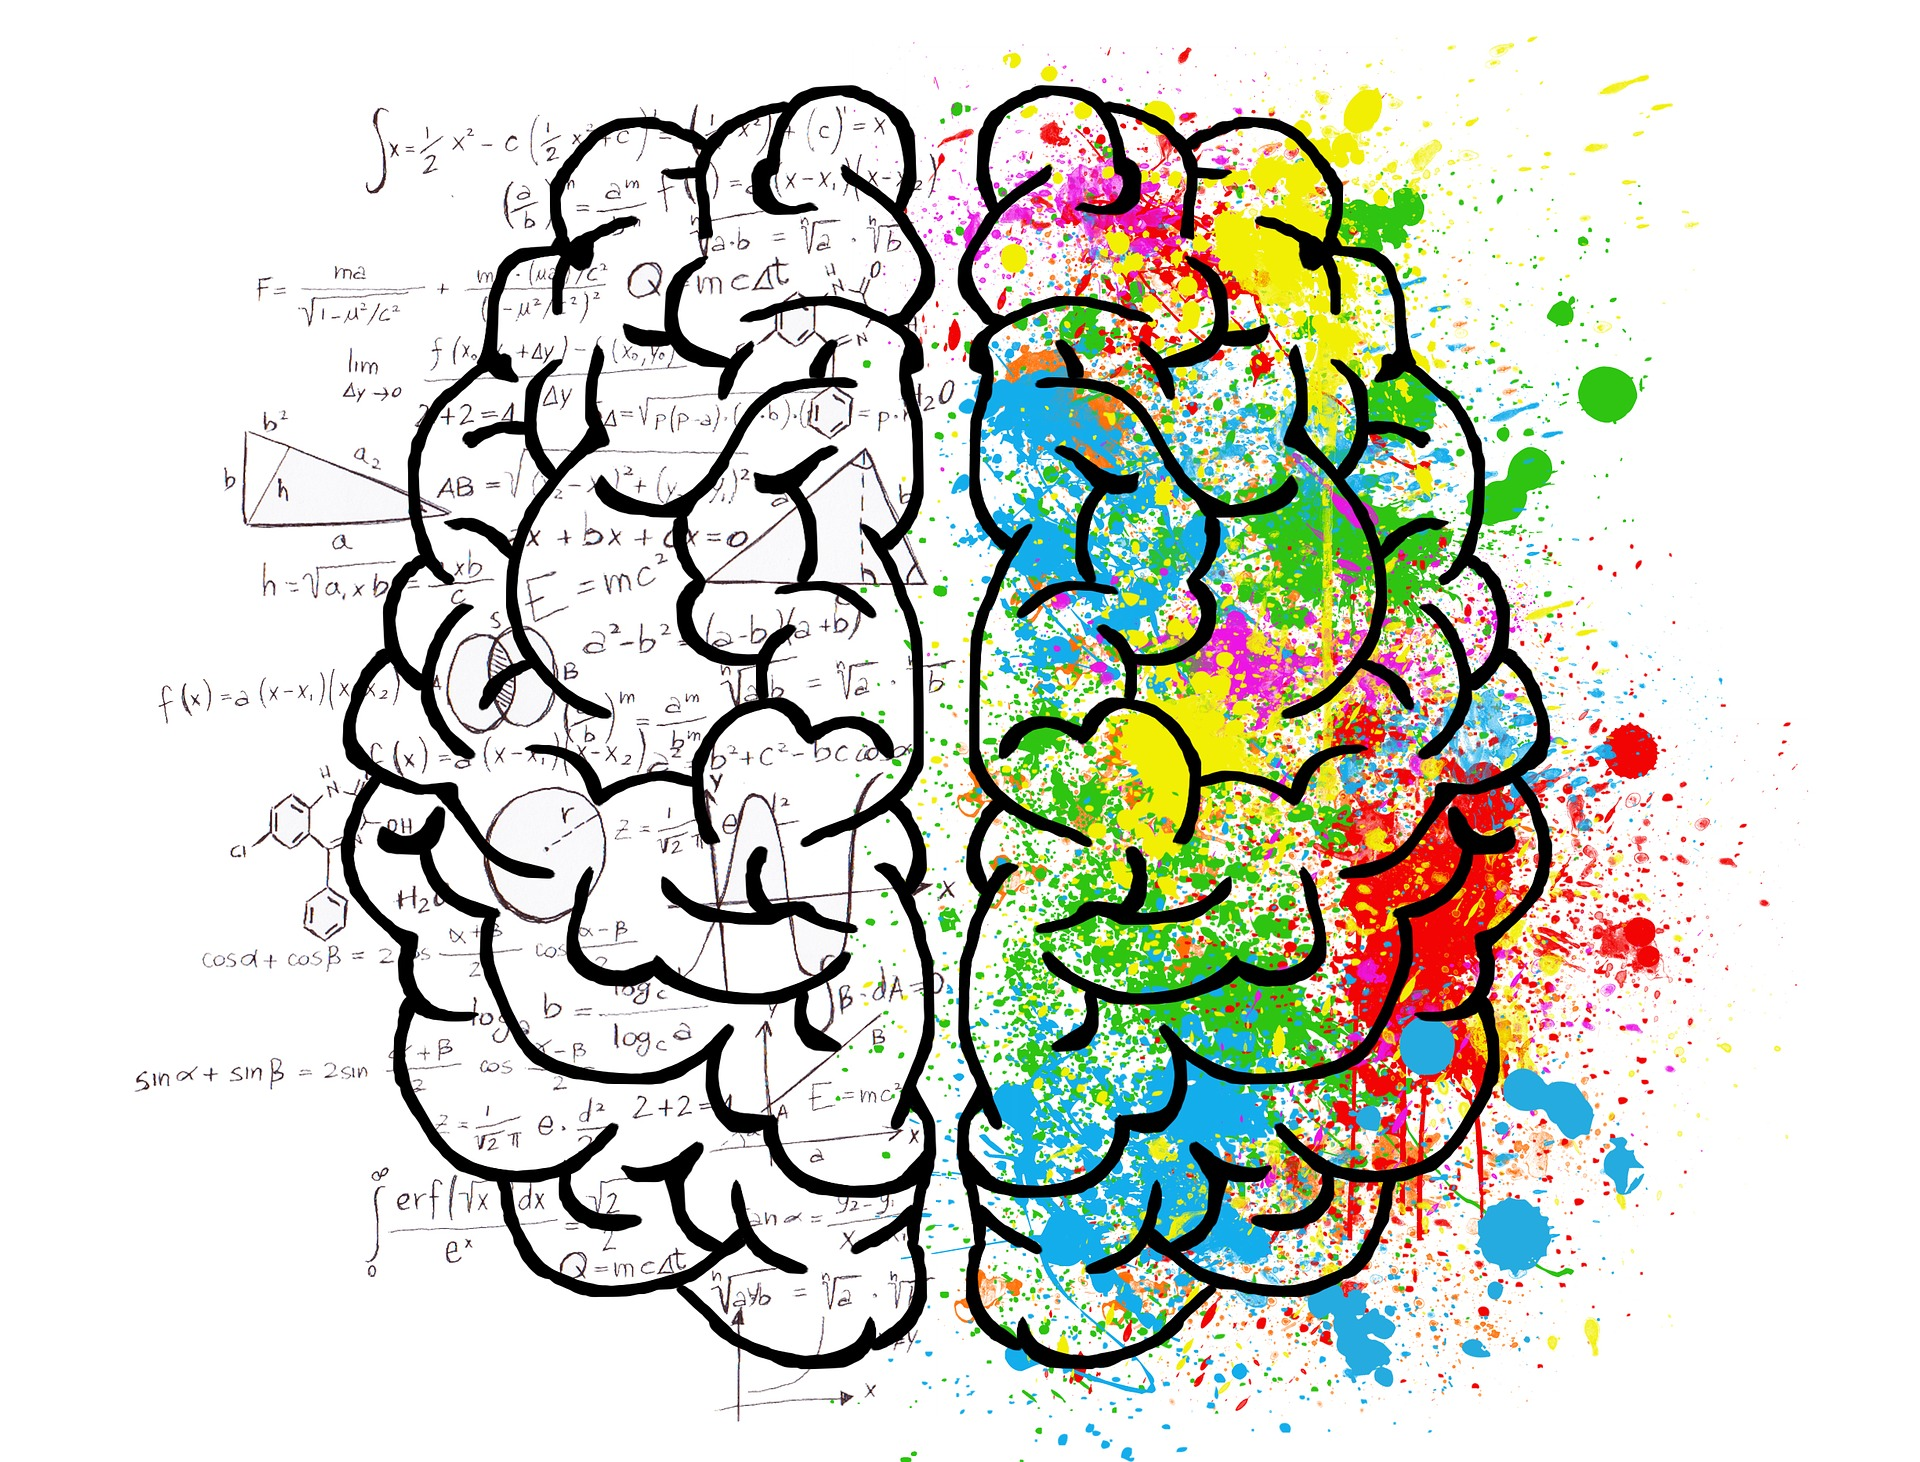 Brain Hemispheres Image – Rick Goodman